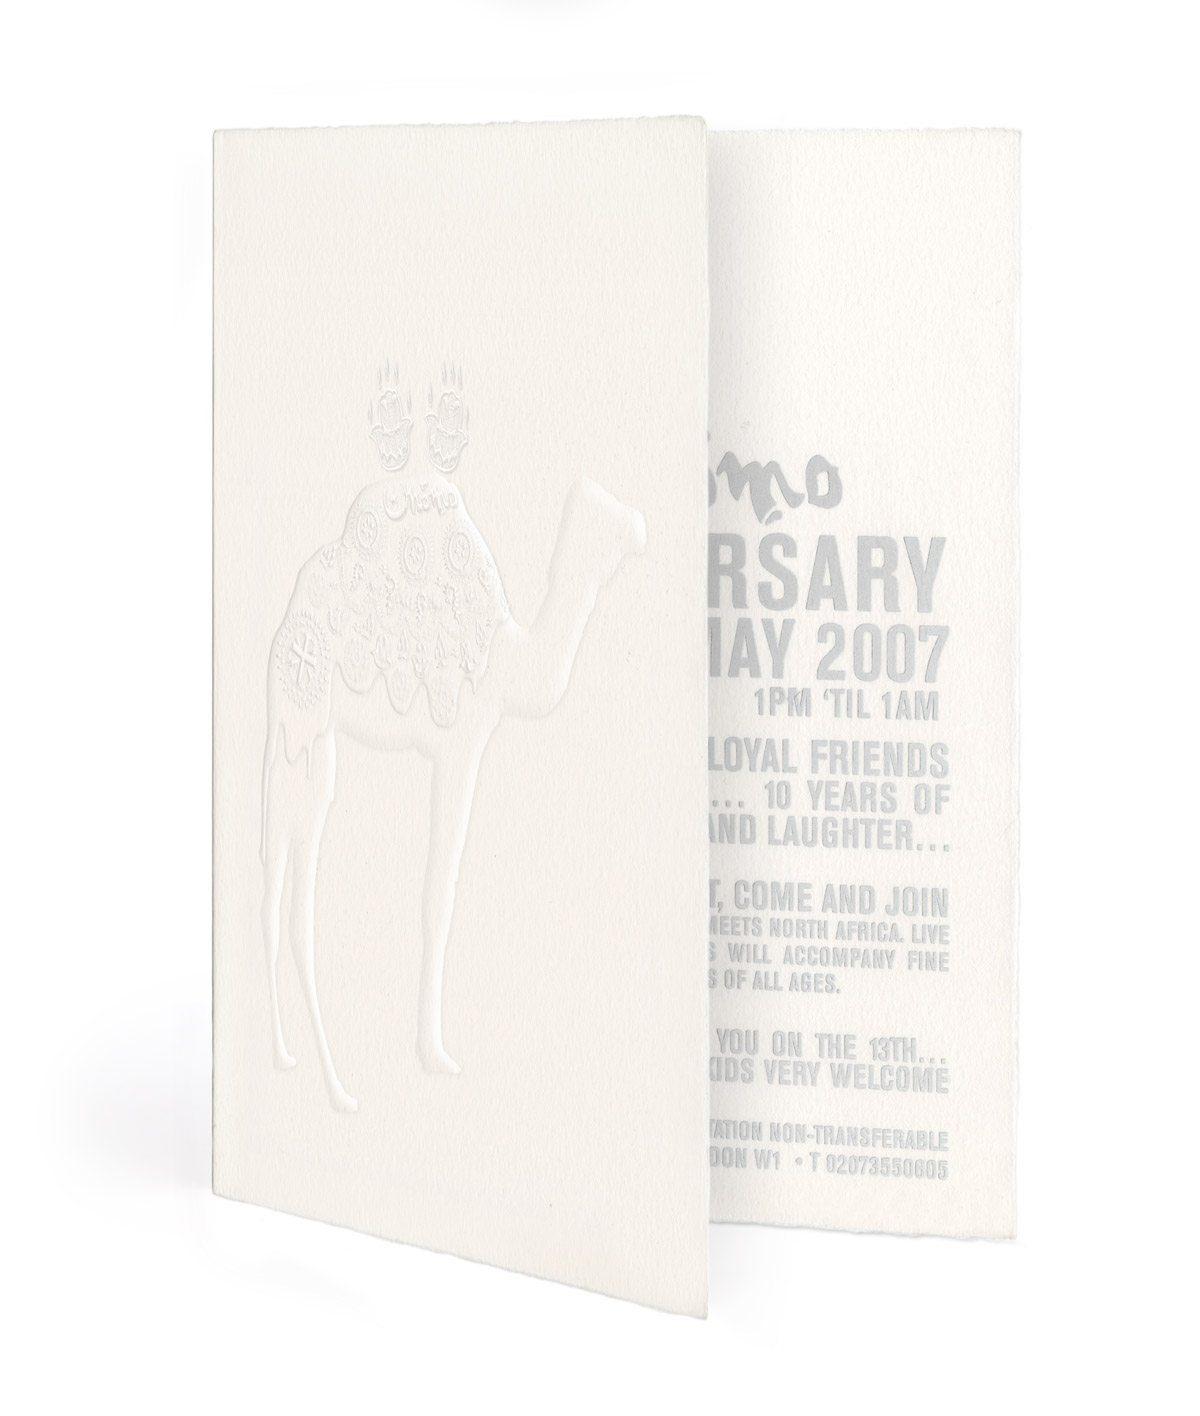 momo 10 anniversaire carton invitation gaufrage ichetkar ouvert typo irisée